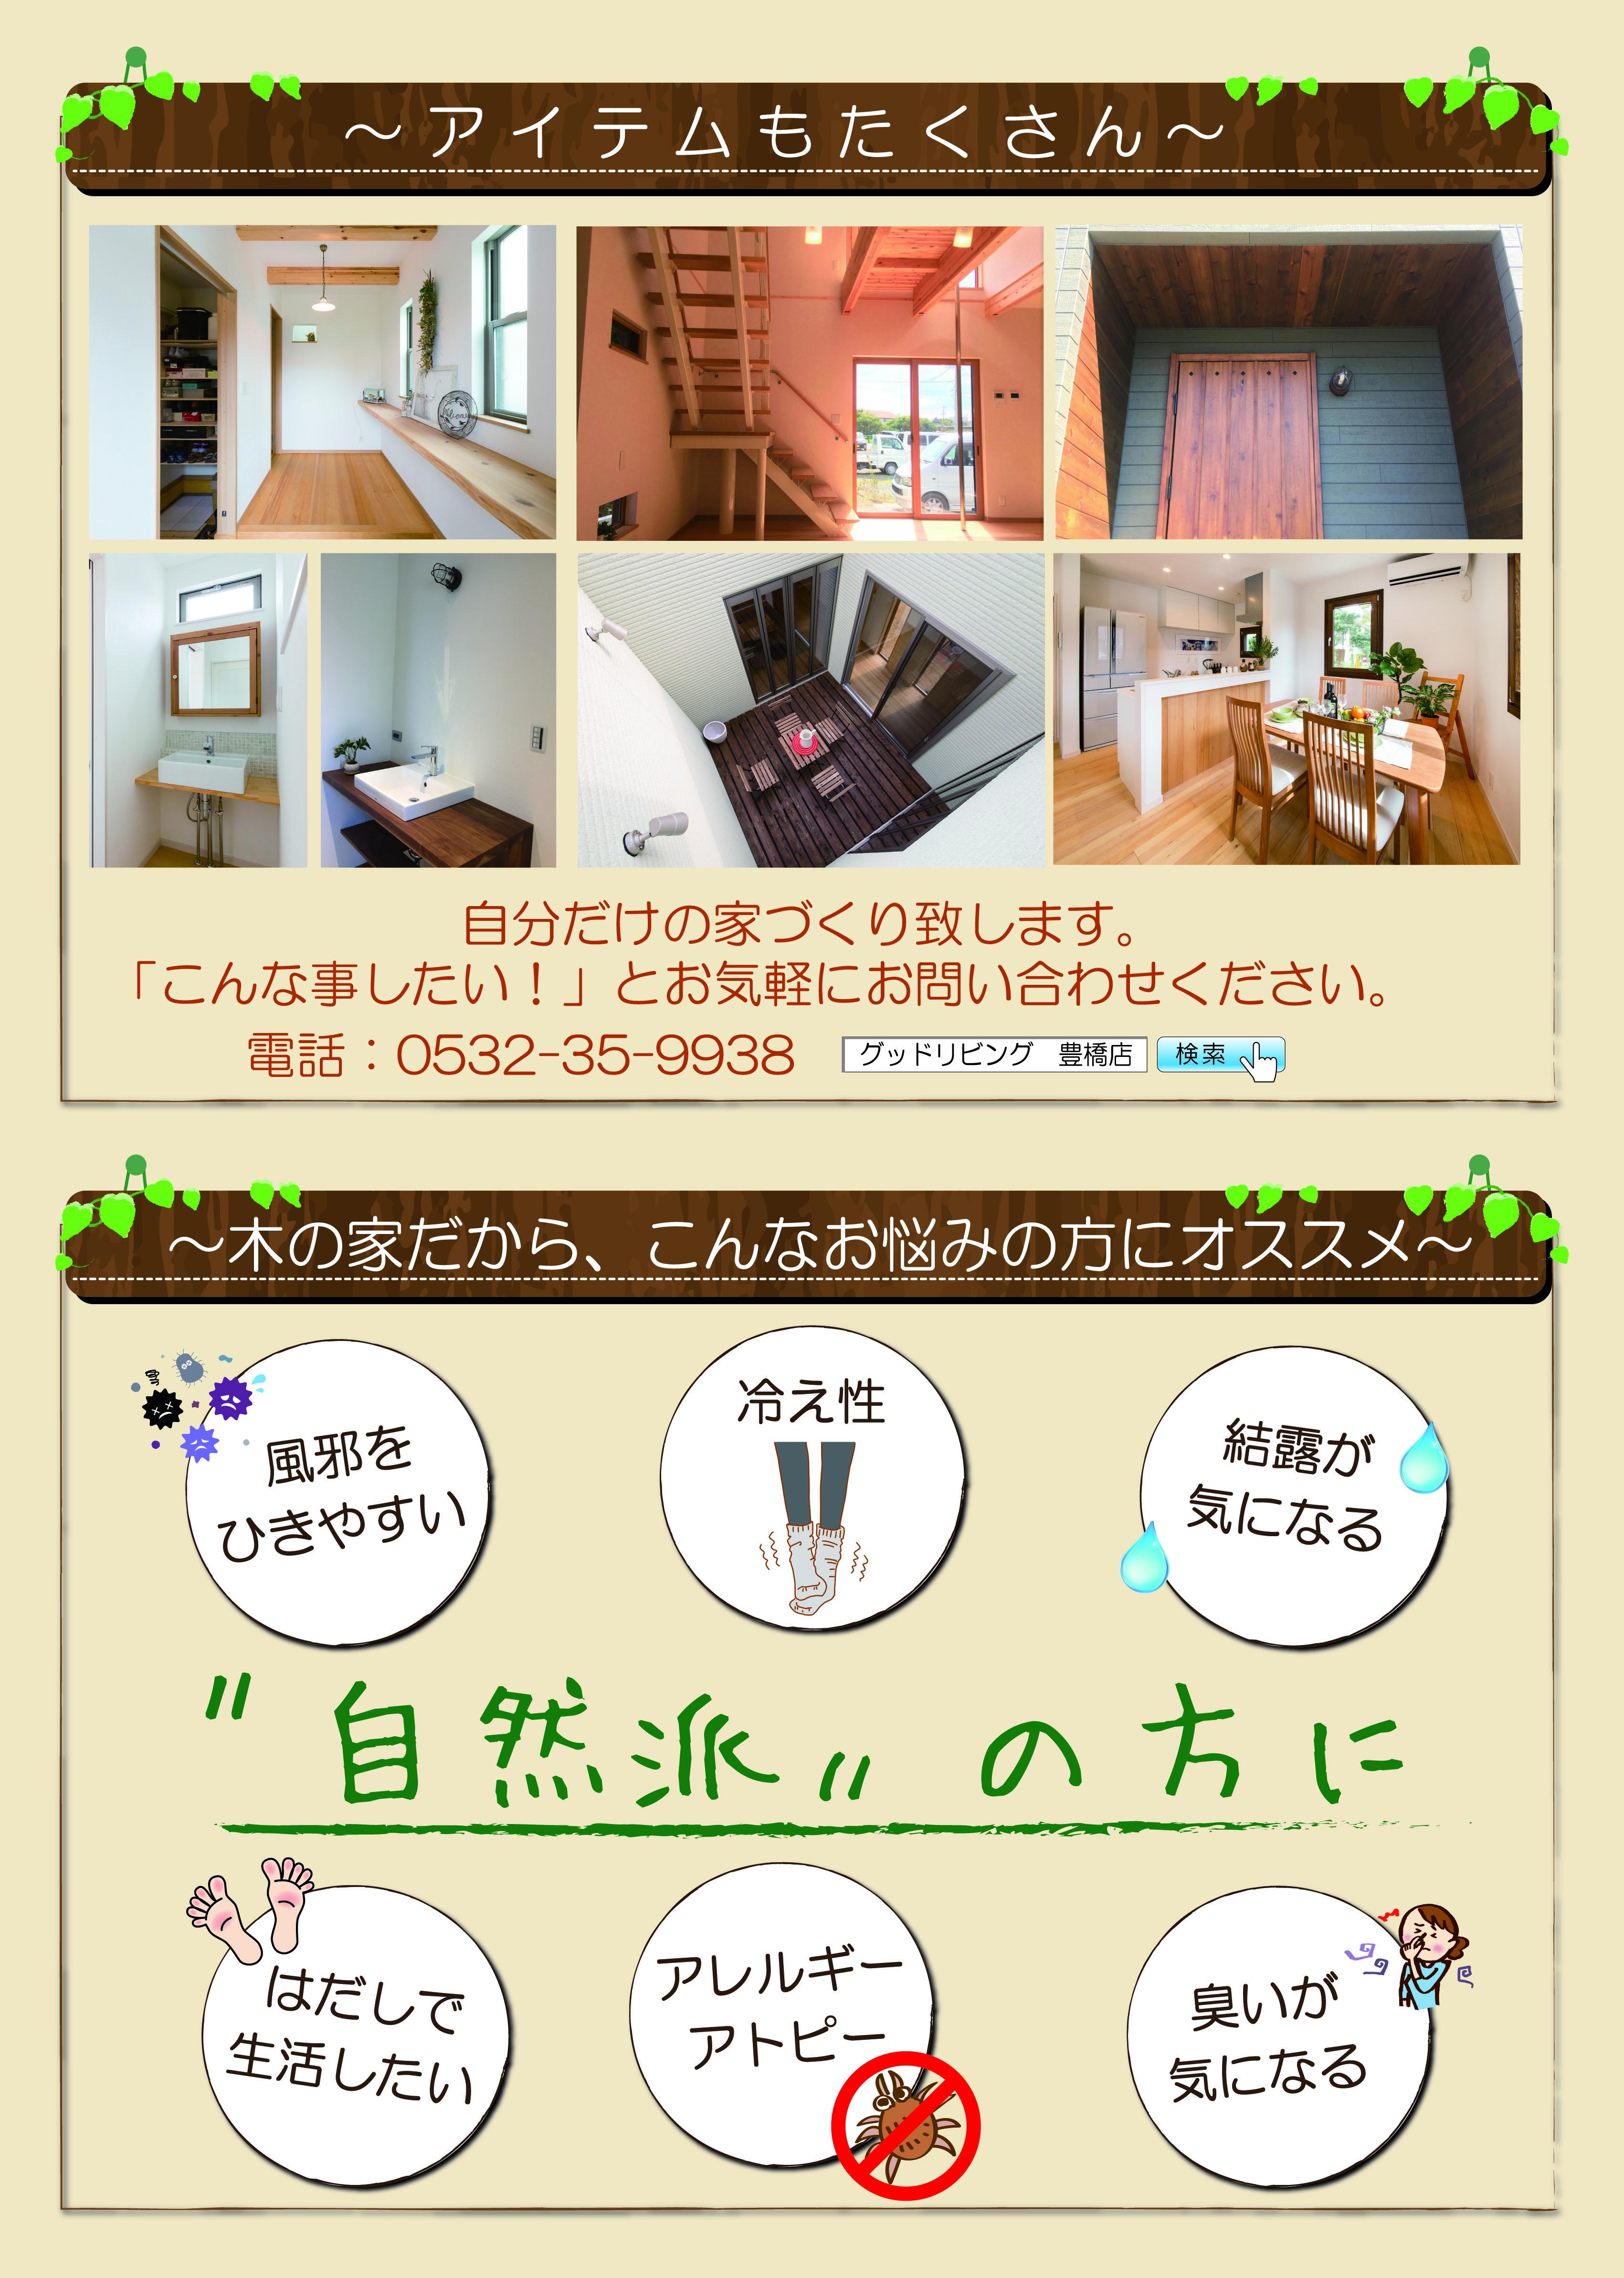 http://good-living.jp/event-information/pic/1806.16-17%E8%B1%8A%E6%A9%8B%E6%9C%A8%E3%81%AE%E5%AE%B6%E8%A3%8F.jpg